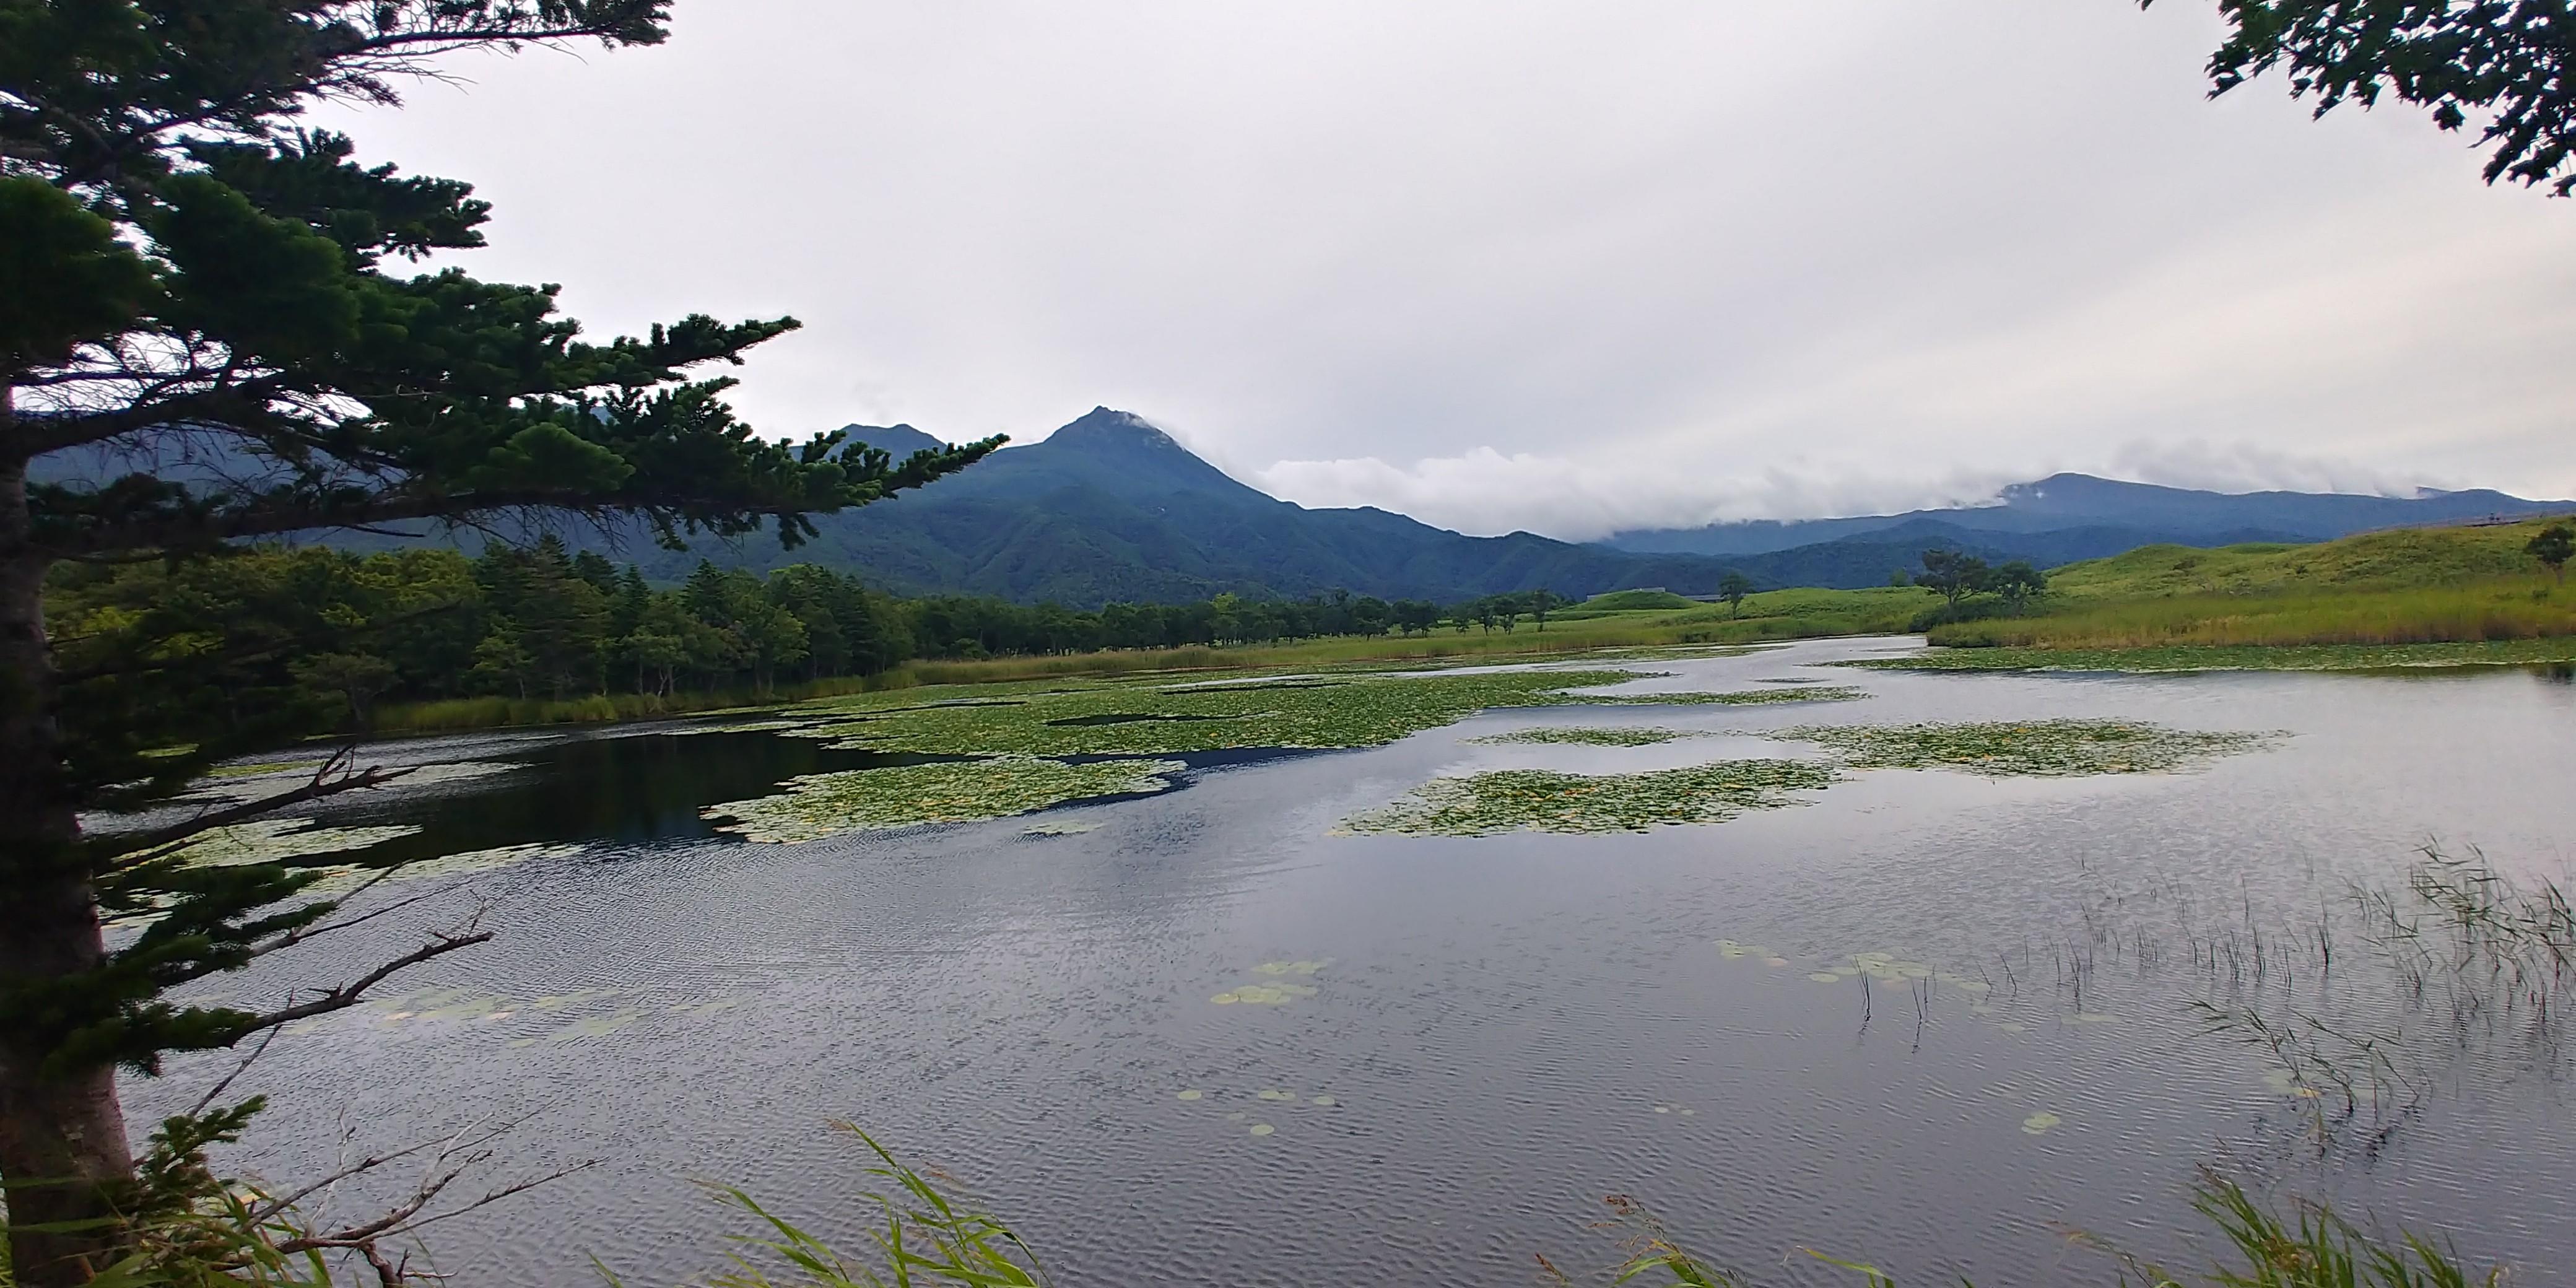 f:id:kishuji-kaisoku:20191228202227j:image